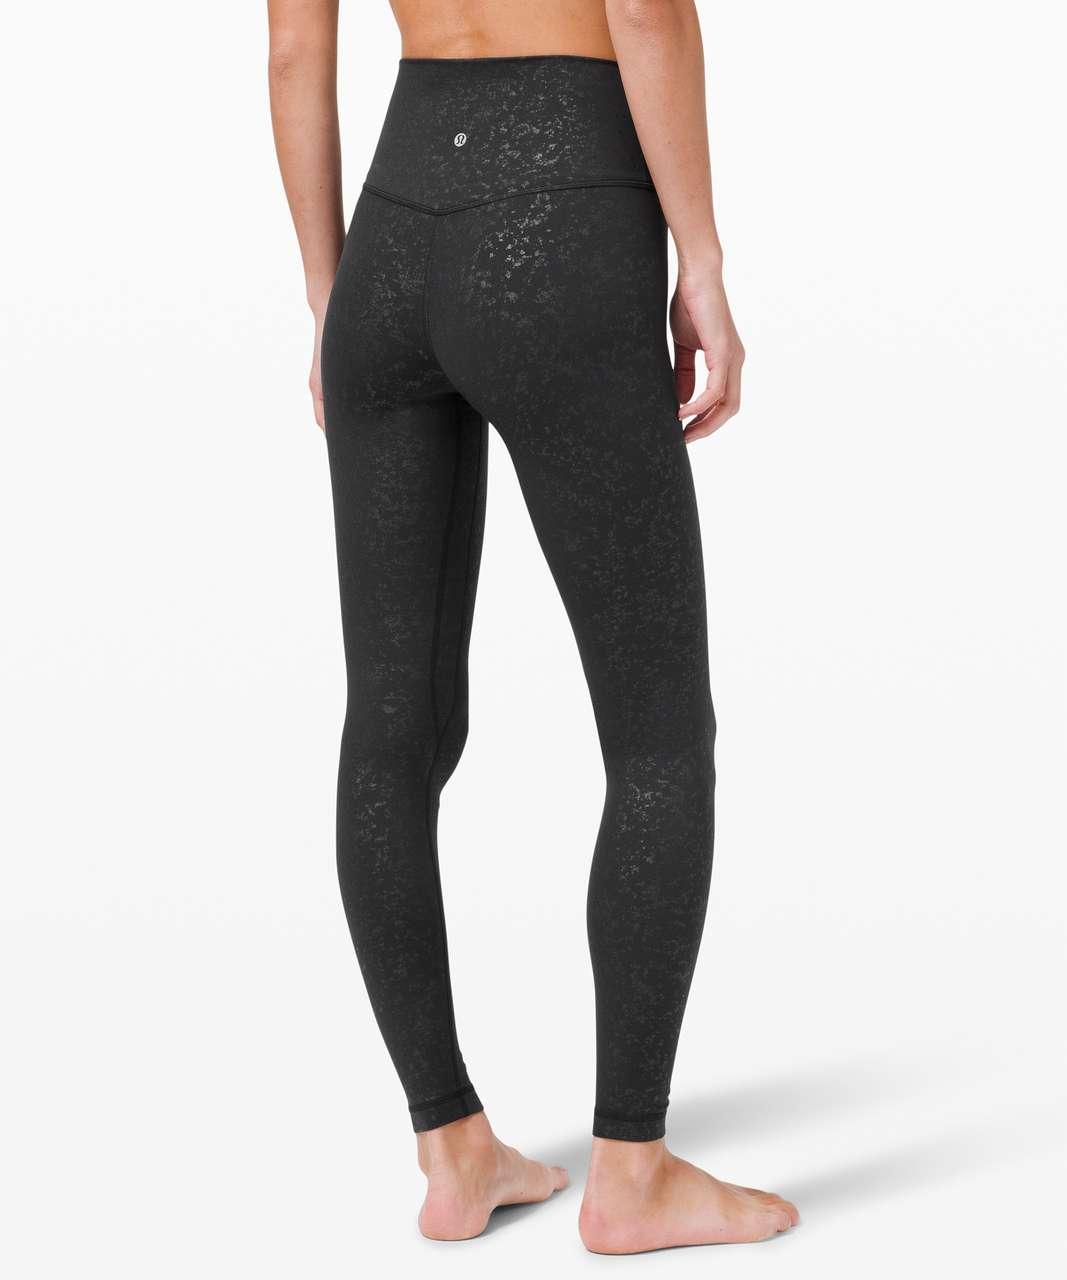 "Lululemon Align Pant 28"" - Speckle Emboss Black"